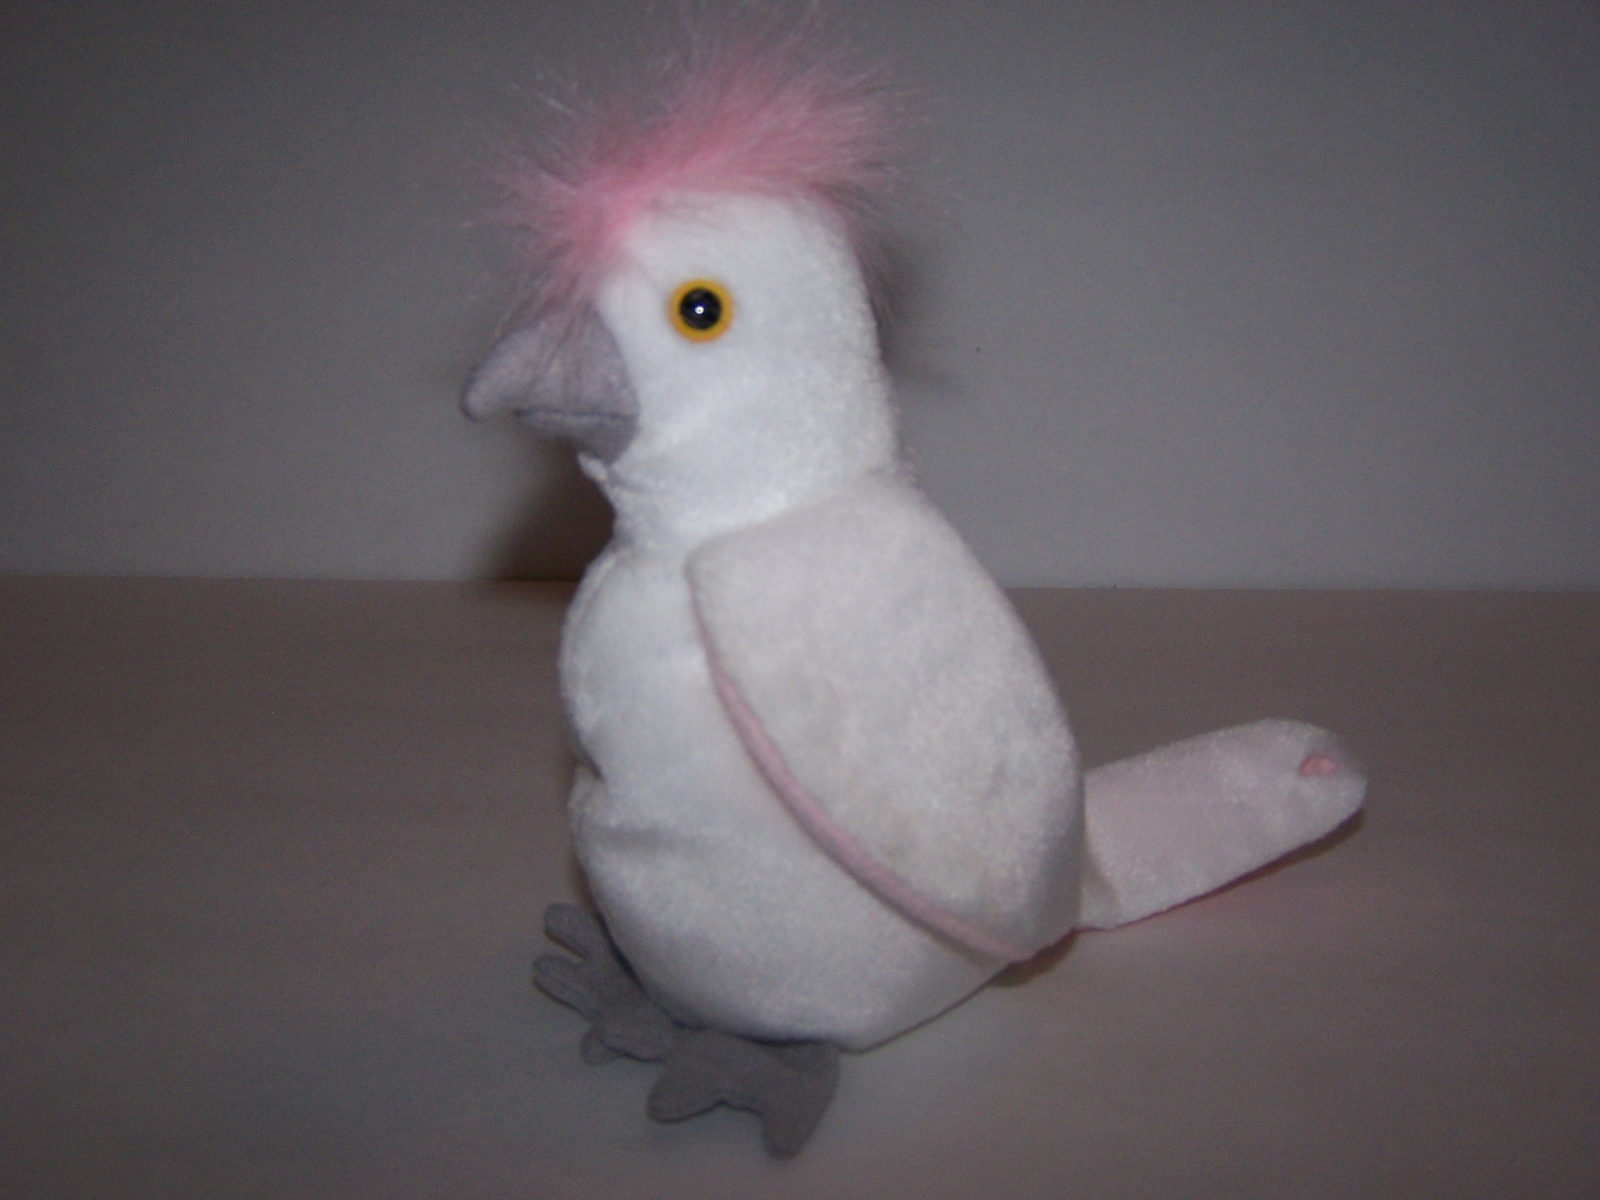 Lot of stuffed animals plush children's toys assorted dog cobra Vulture parrot